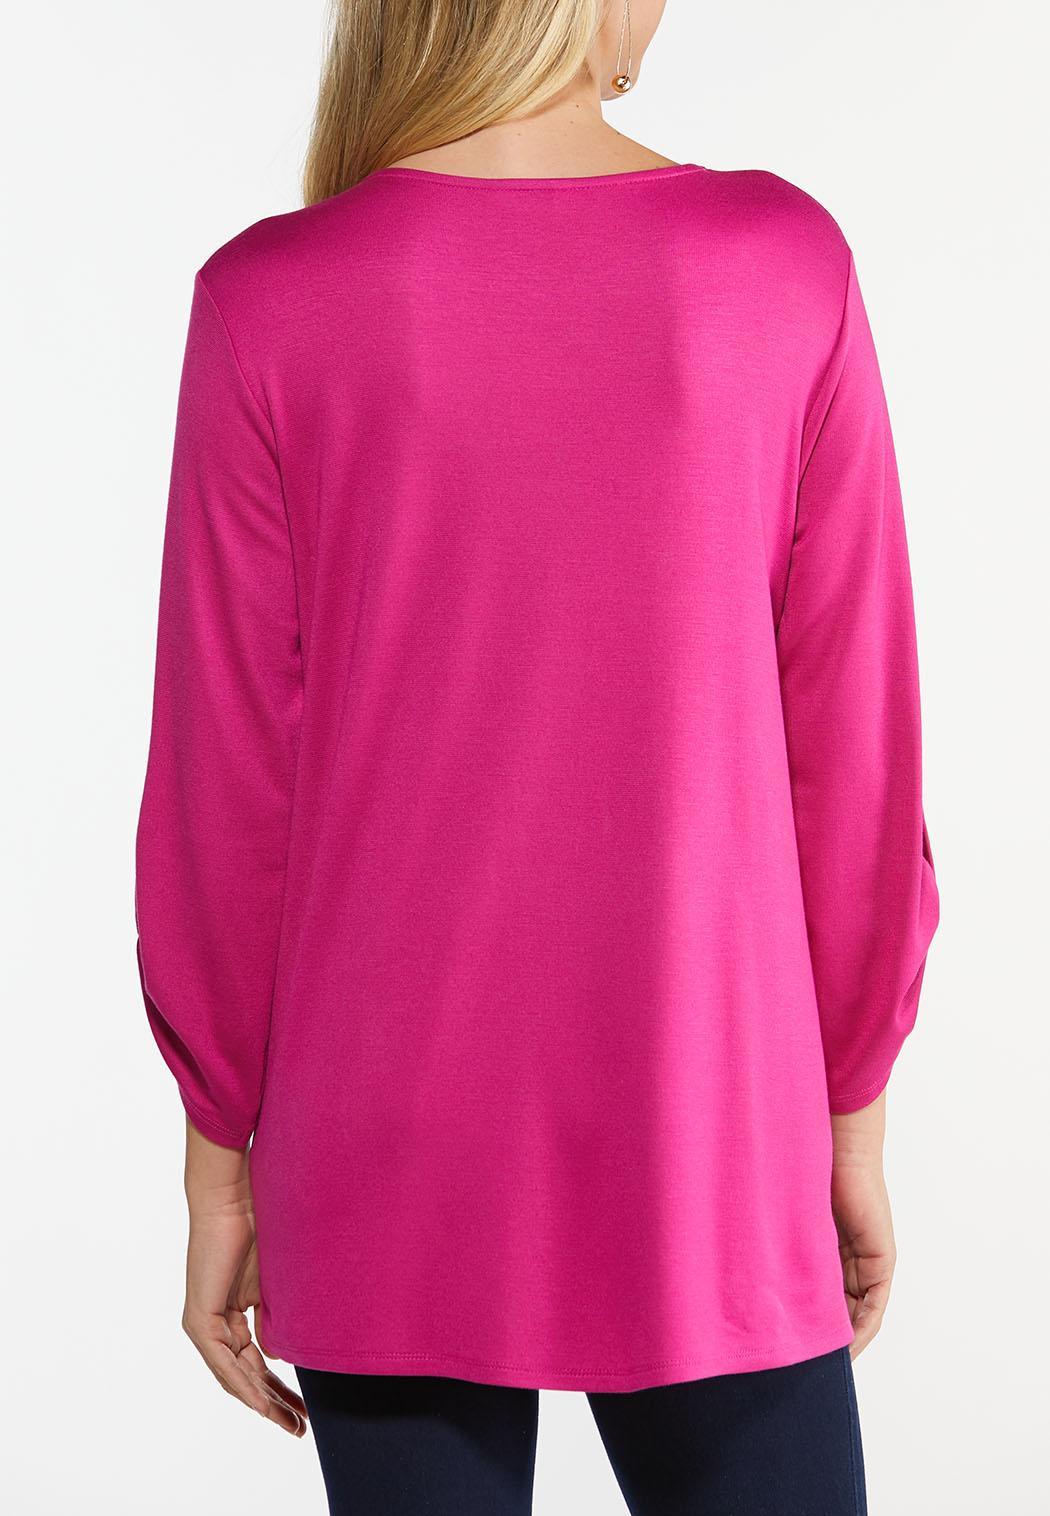 Fuschia Lace Up Tunic (Item #44480226)